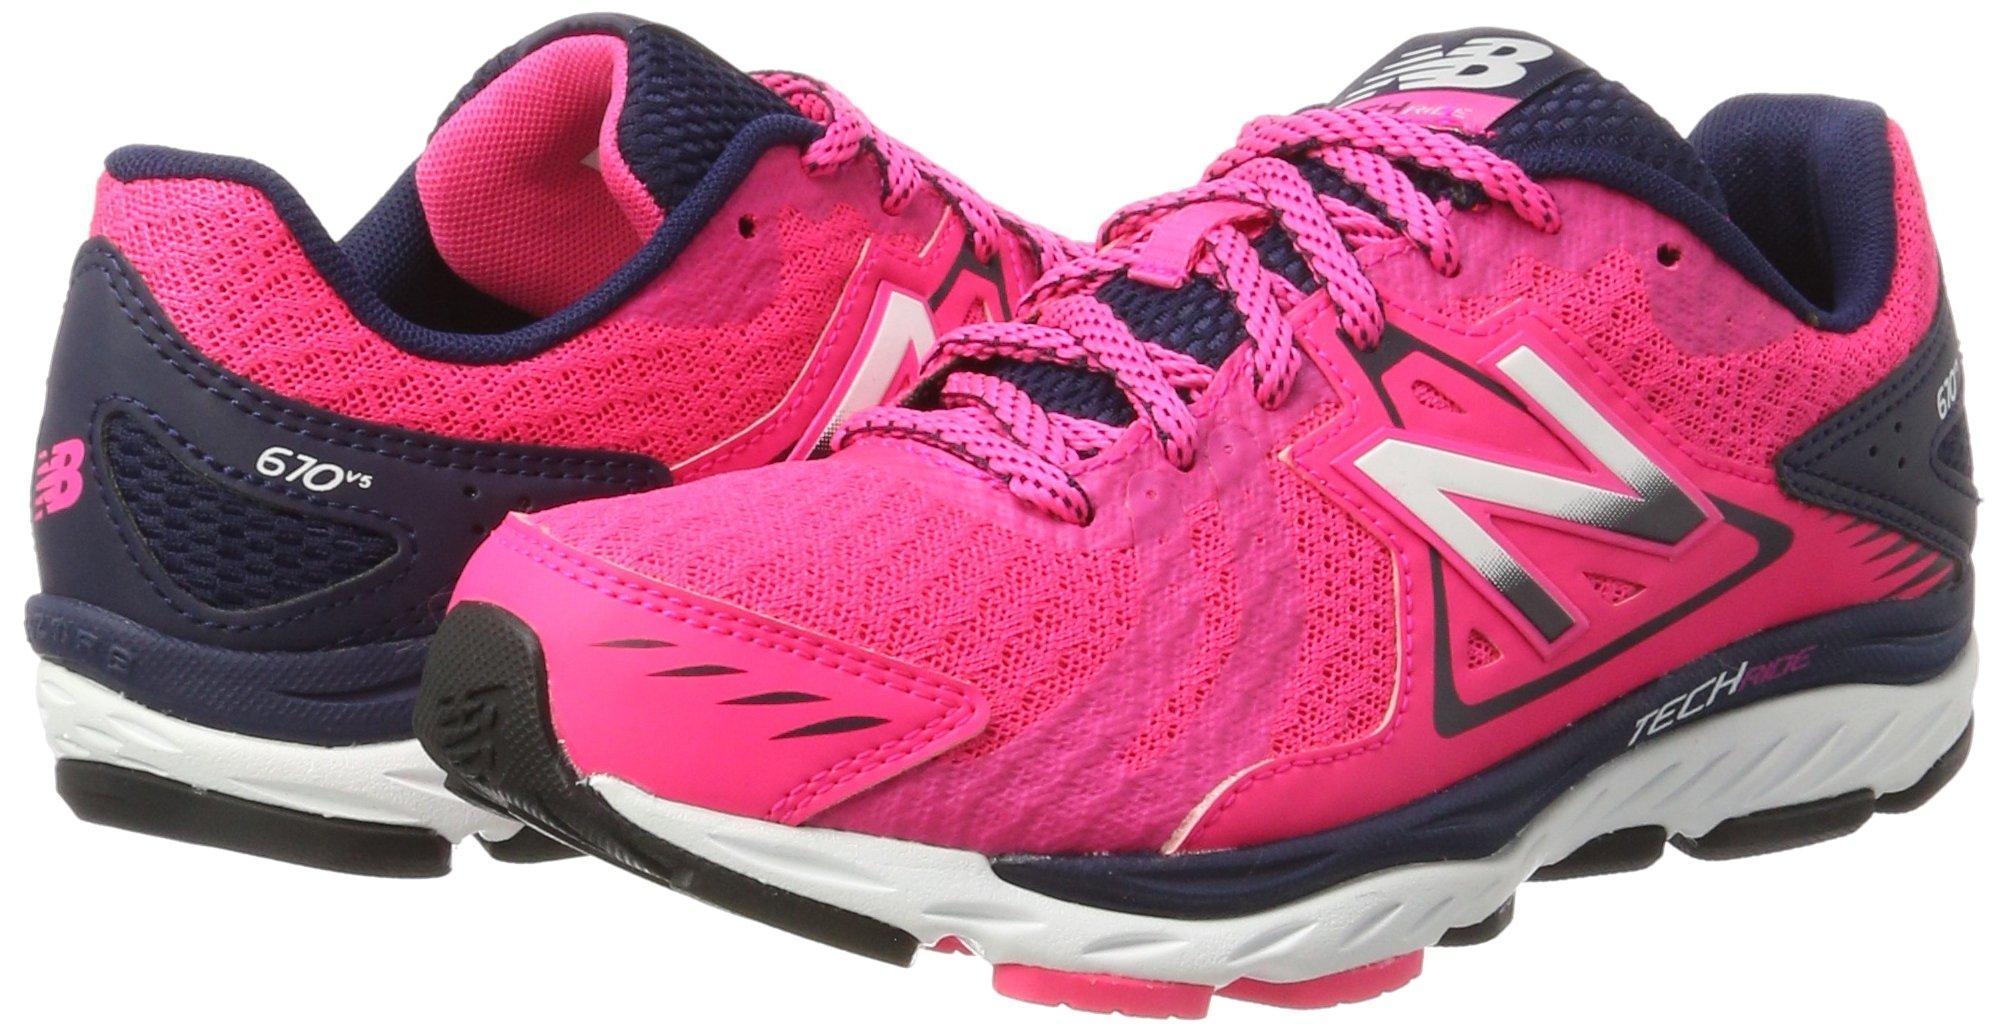 New Balance Women's 670v5 Fitness Shoes